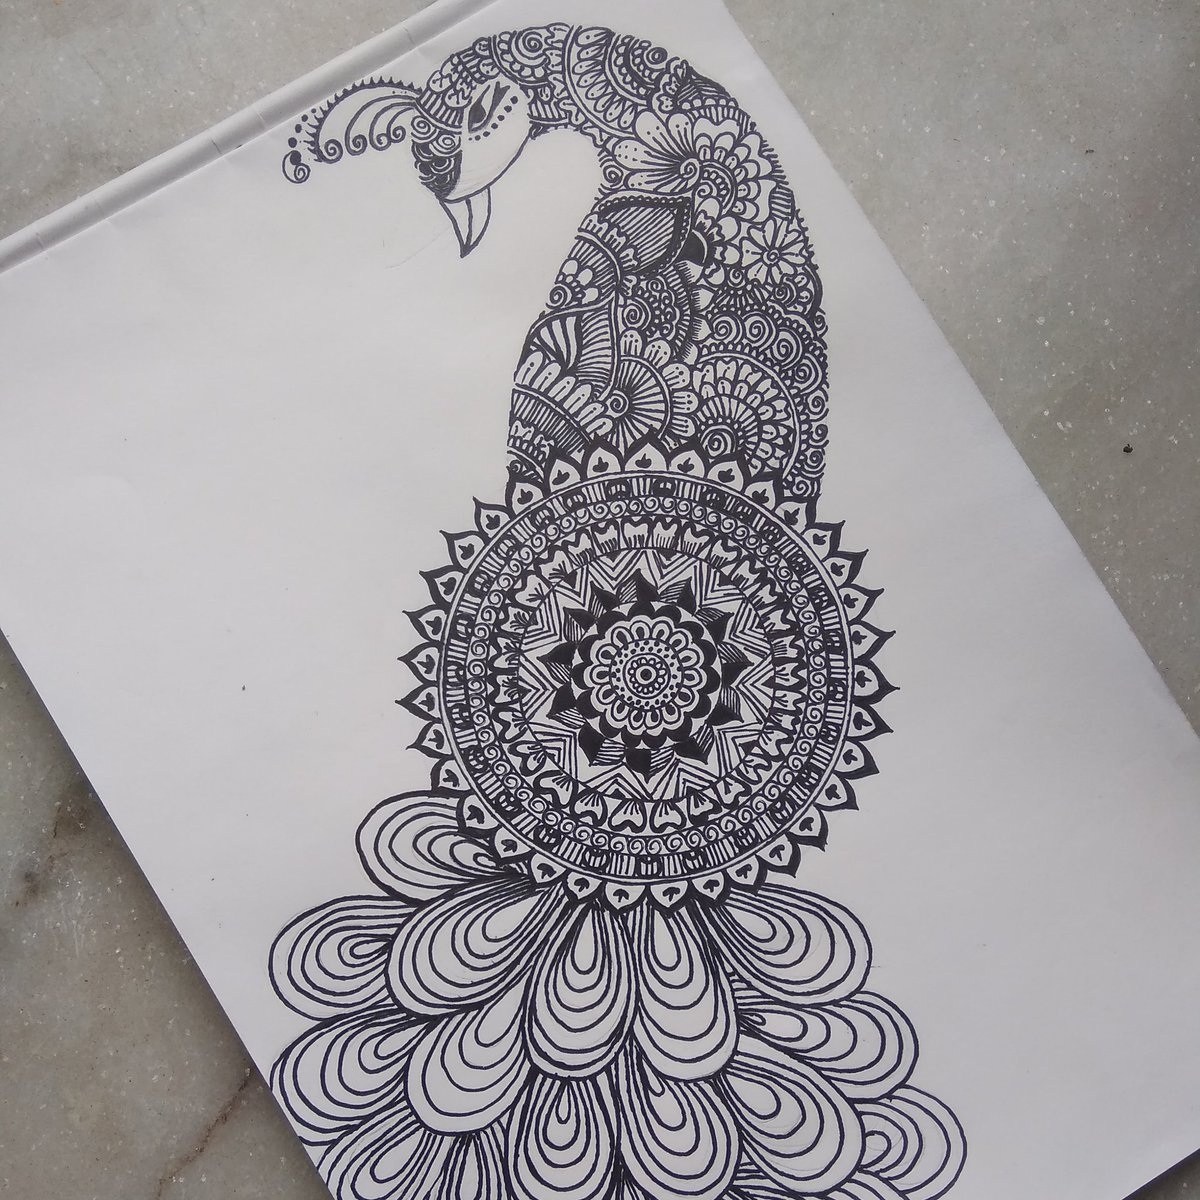 #MandalaArt #peacock #nationalbird #lovemanadala #lovedrawing  Hit a like  Follow for morepic.twitter.com/Qhaor62ydY